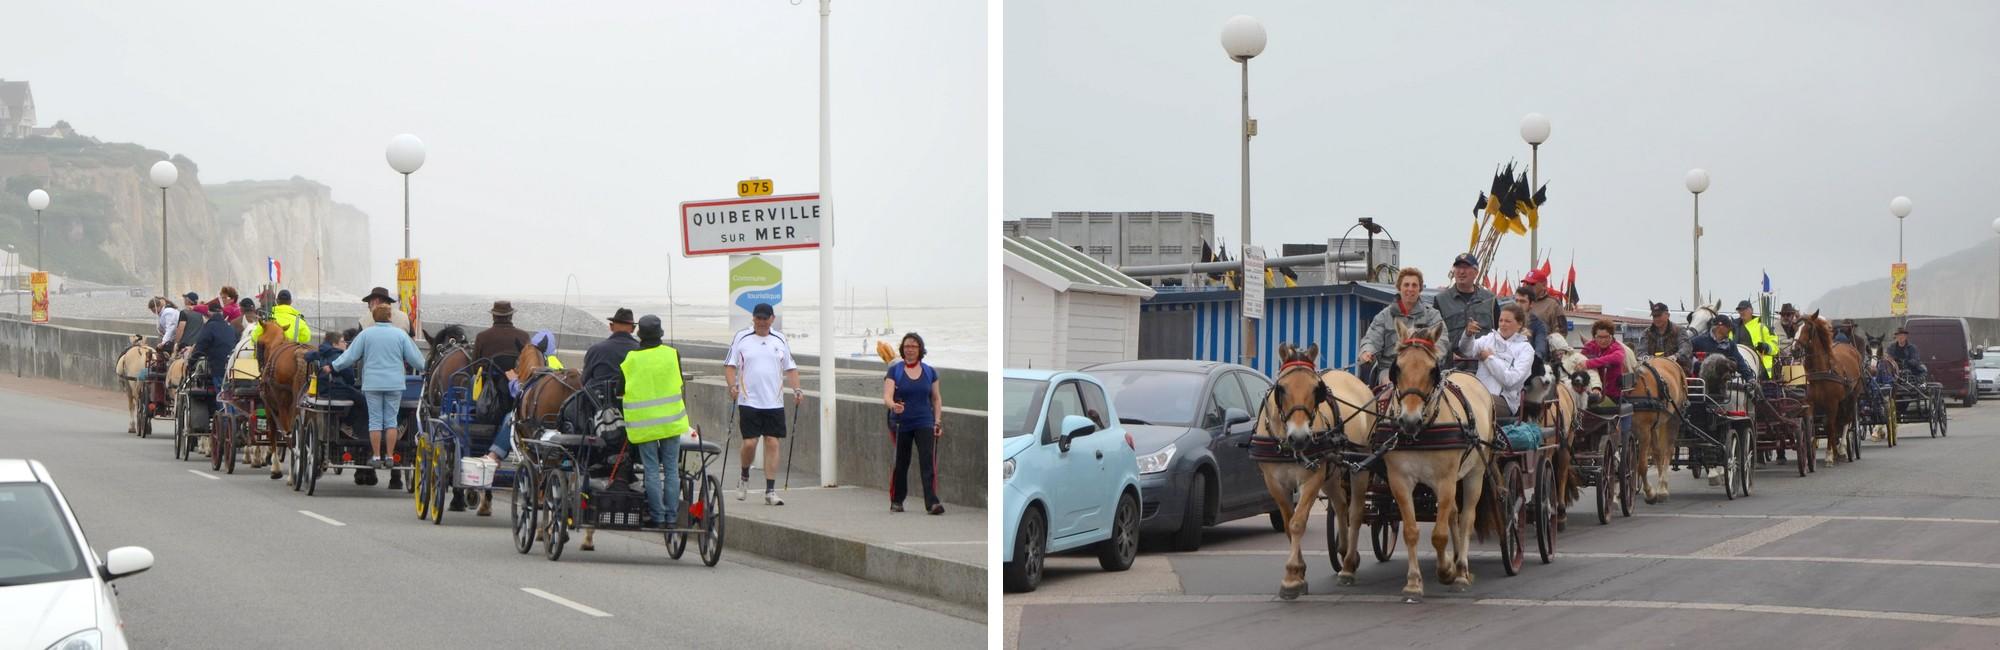 "13 au 17 juillet - Randonnée attelage ""Baie de Somme-> Baie de Seine !"" - Page 2 NkY9onSIwt9lnCWroZ5LHHQ6PCA"